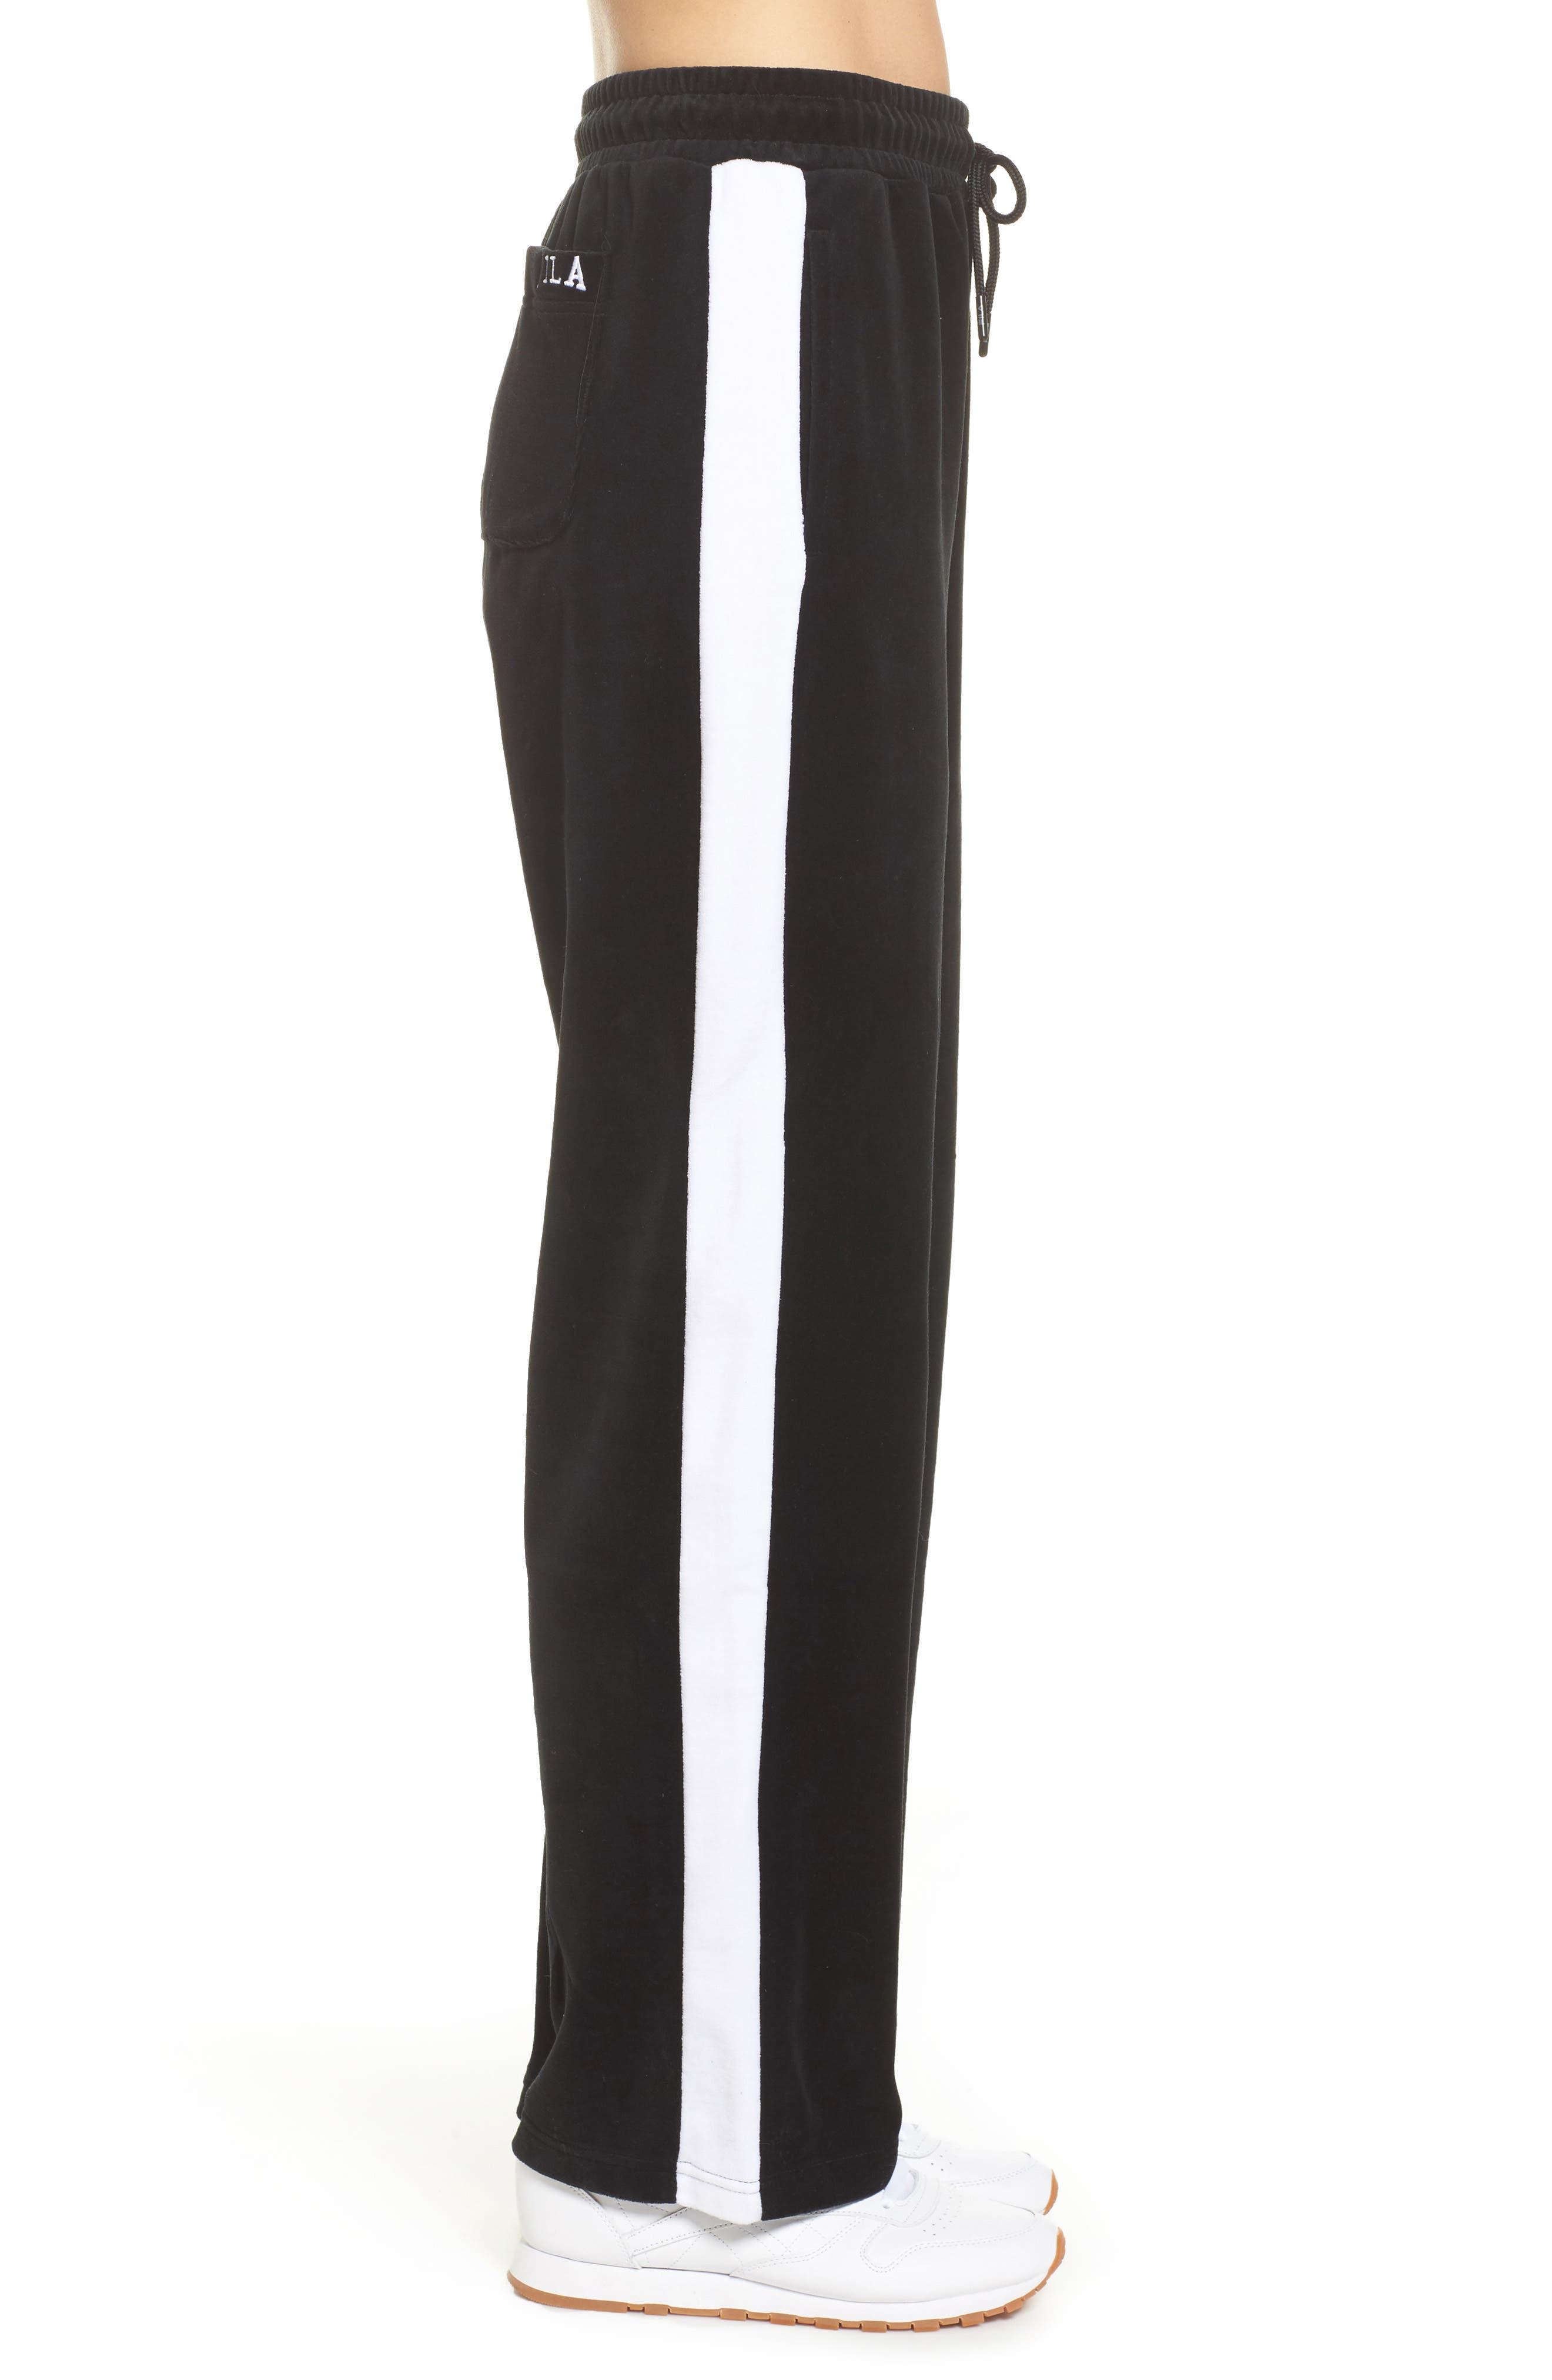 Bonnie Velour Track Pants,                             Alternate thumbnail 3, color,                             Black/ White